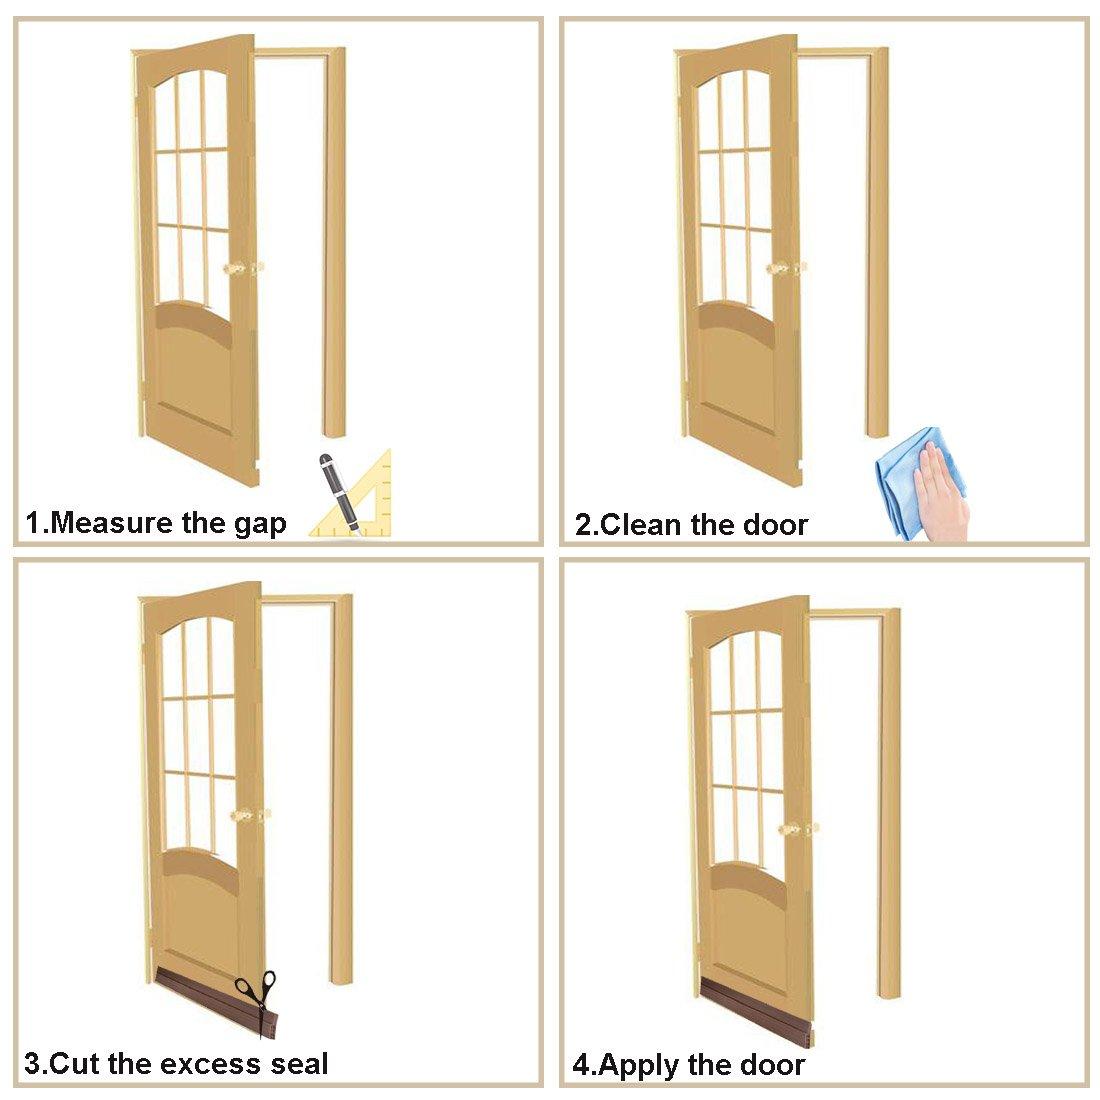 MAZU Door Bottom Seal Strip Energy & Money Saving in Winter Save Air Conditioner Cost Keep Bugs&Noise Off Under Door Sweep Weather Stripping Door Draft Stopper 2'' x 39'' (Brown) by MAZU (Image #7)